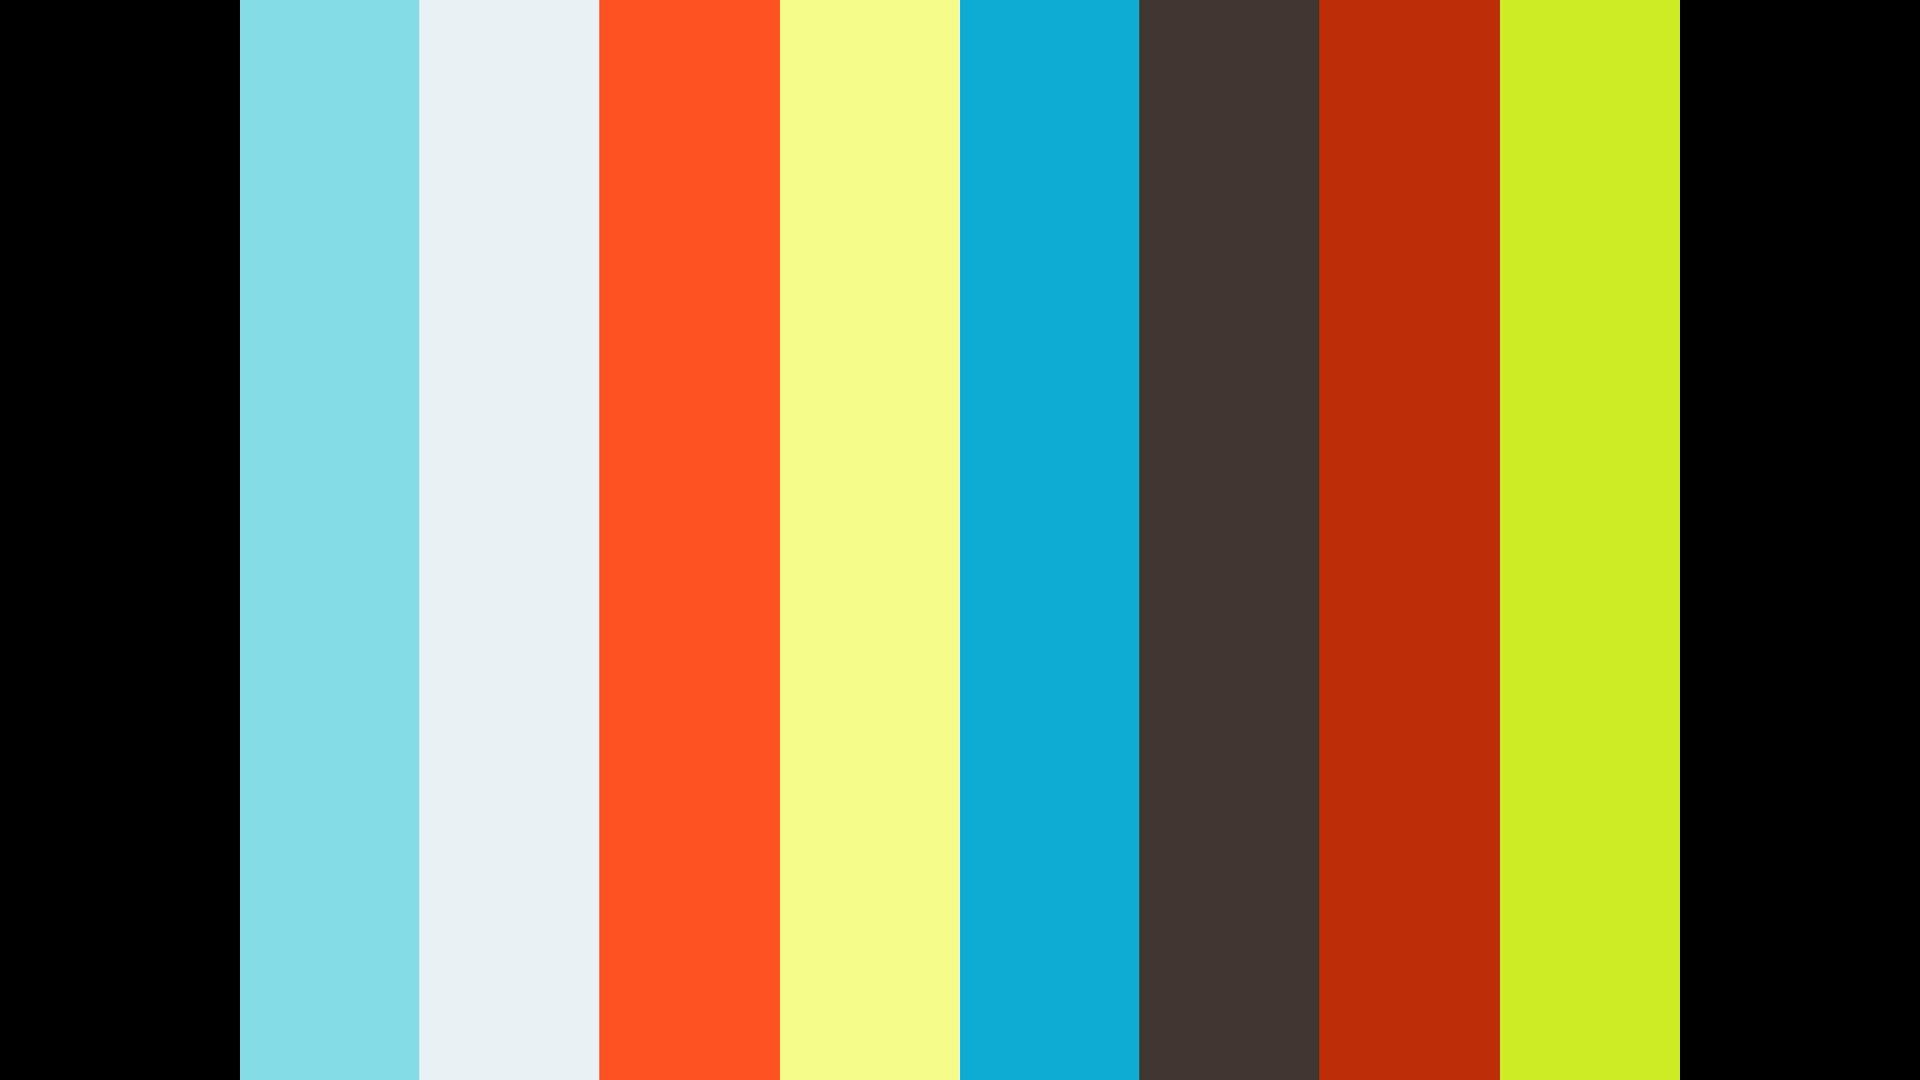 CHERYL - ABSOLUTE 45 (2 AUGUST 2021)